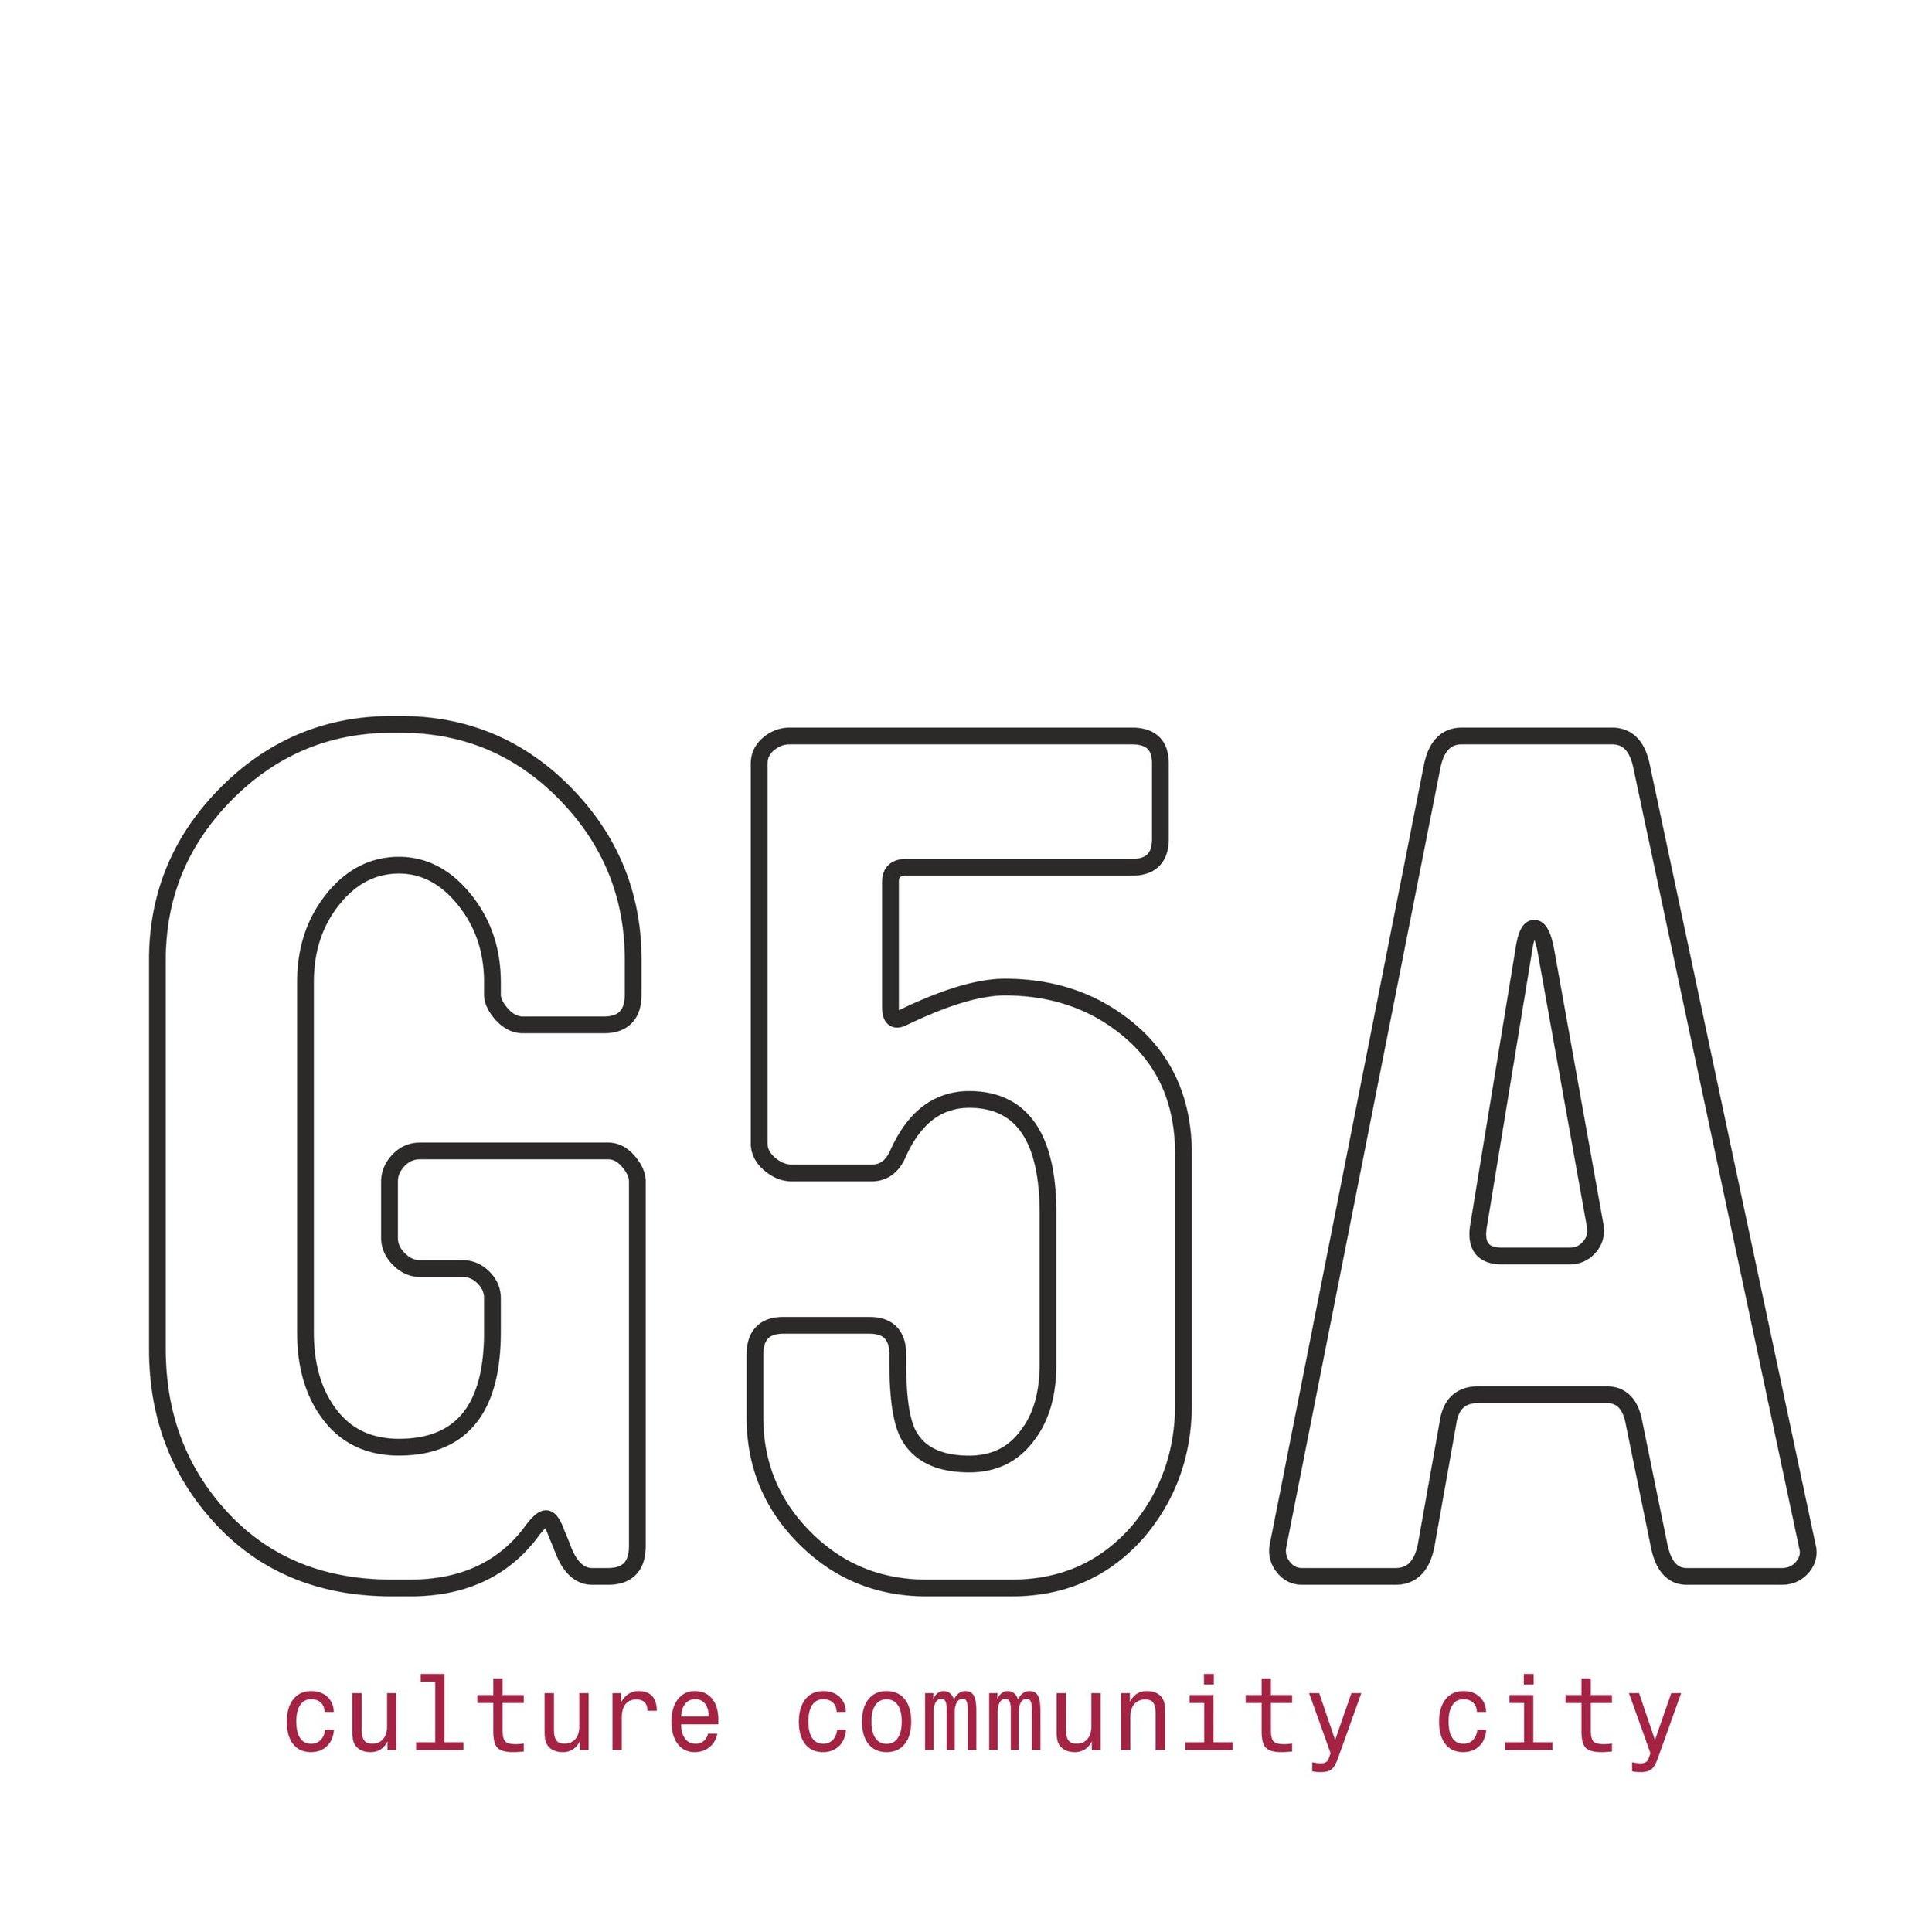 g5a.jpeg